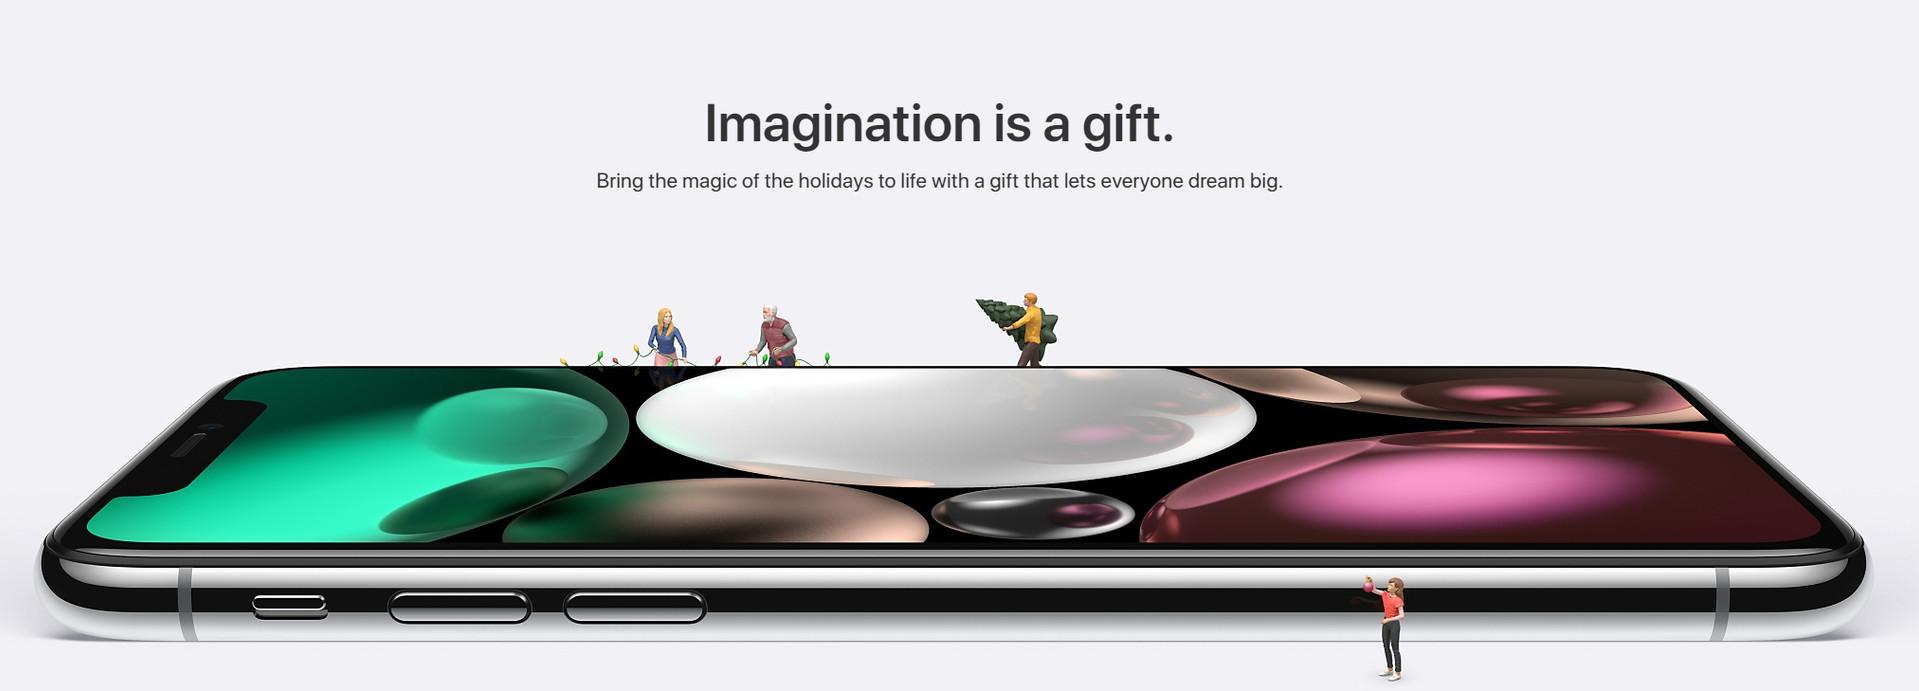 Apple-2017-holiday-gift-guide-00 (1).jpg